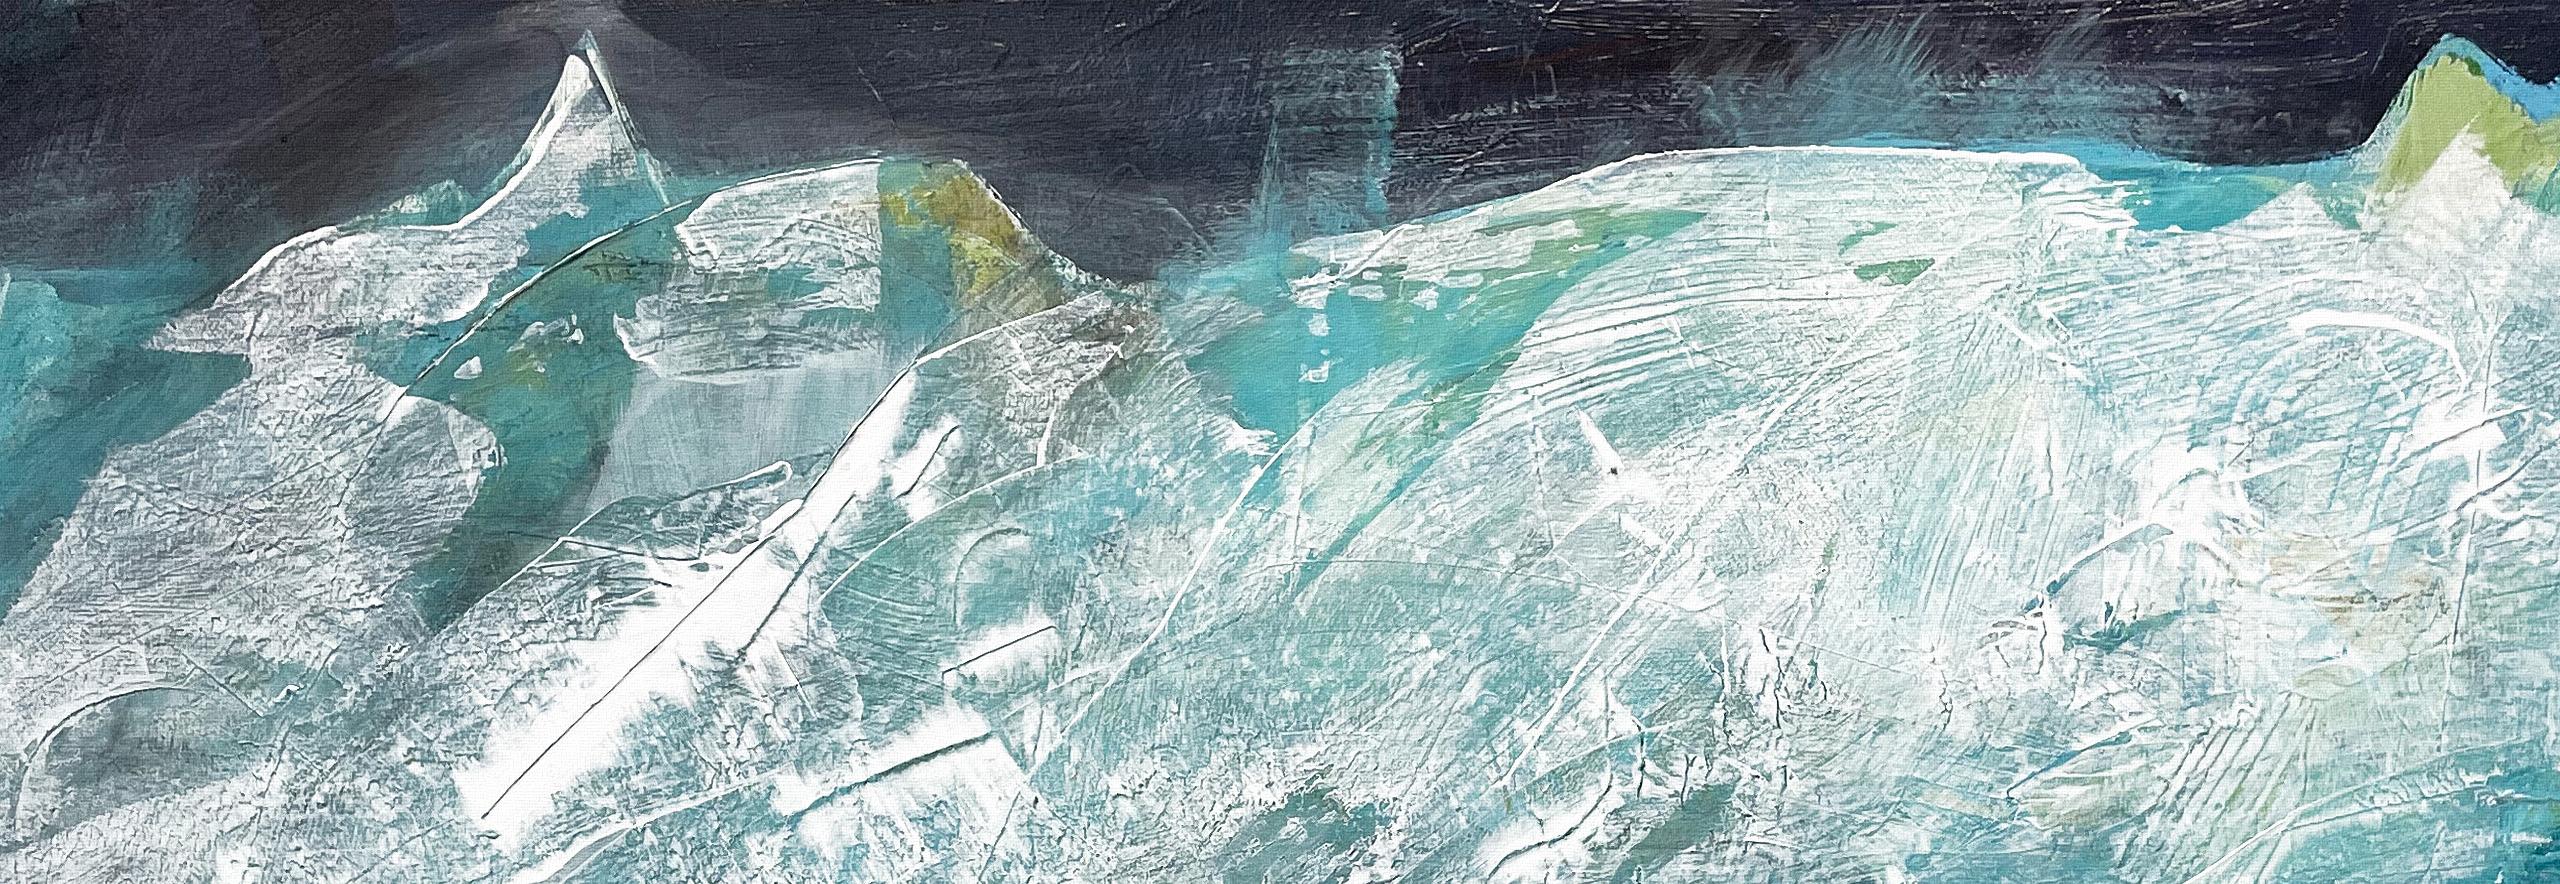 "Aktuelles / News Sylvia Gatz. ""Ohne Titel (Massif central)"". Detail. 80 x 80 cm. Acryl auf Leinwand. 2021"